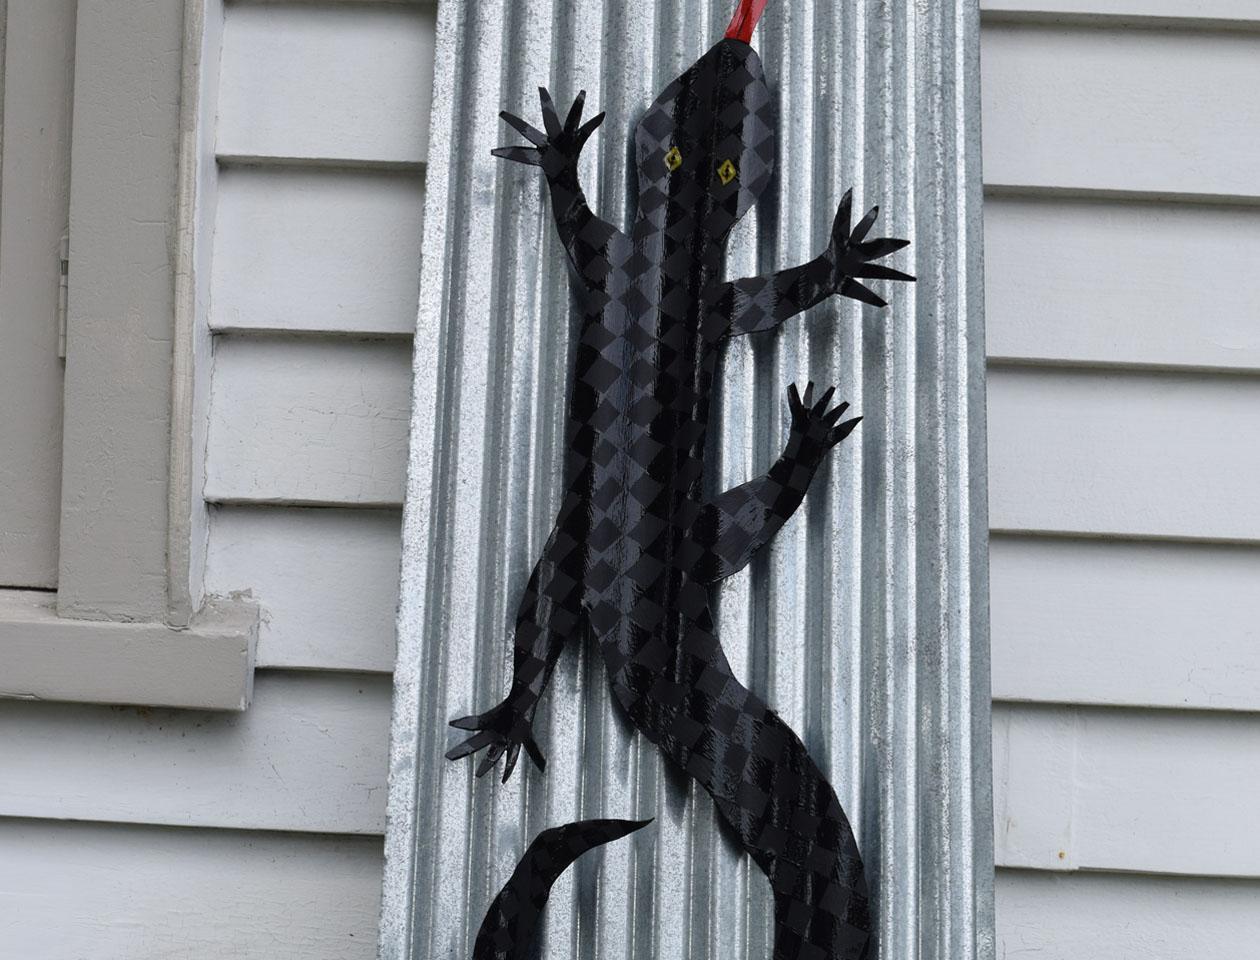 Black On Black Lizard Corrugated Iron Garden Art   Felt